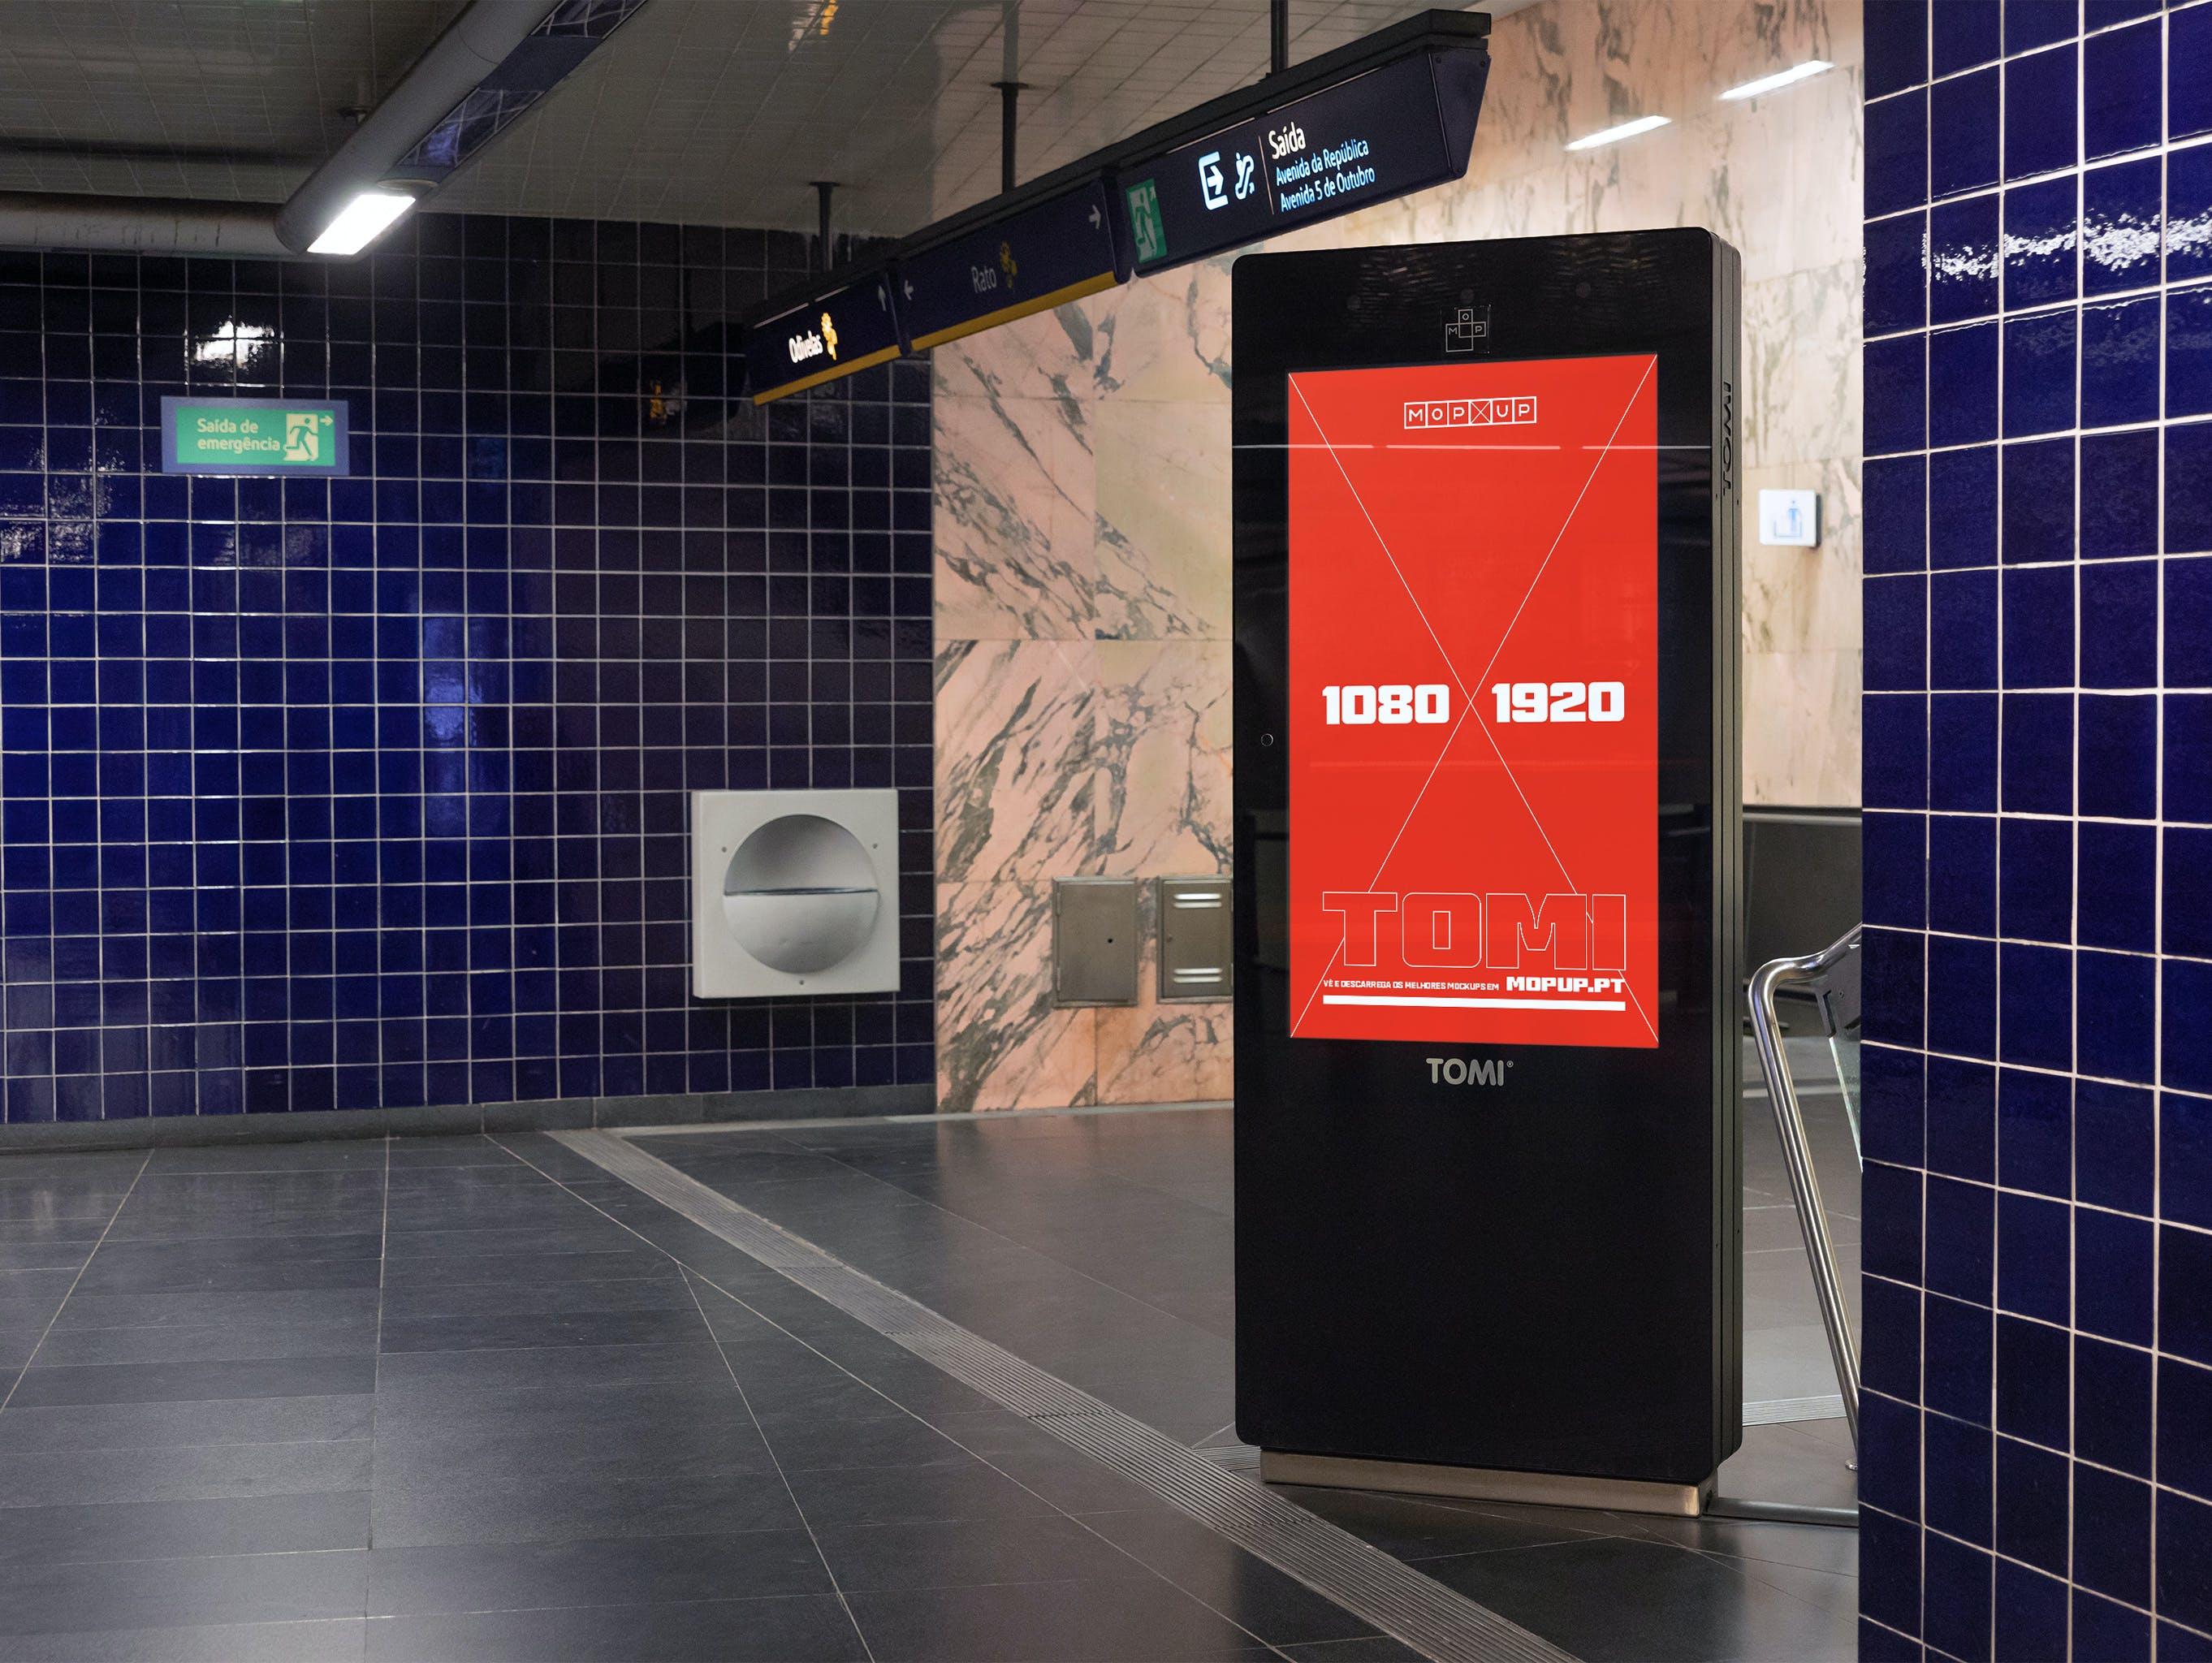 MOPUP - Mupi Digital Metro Saldanha - Mockup